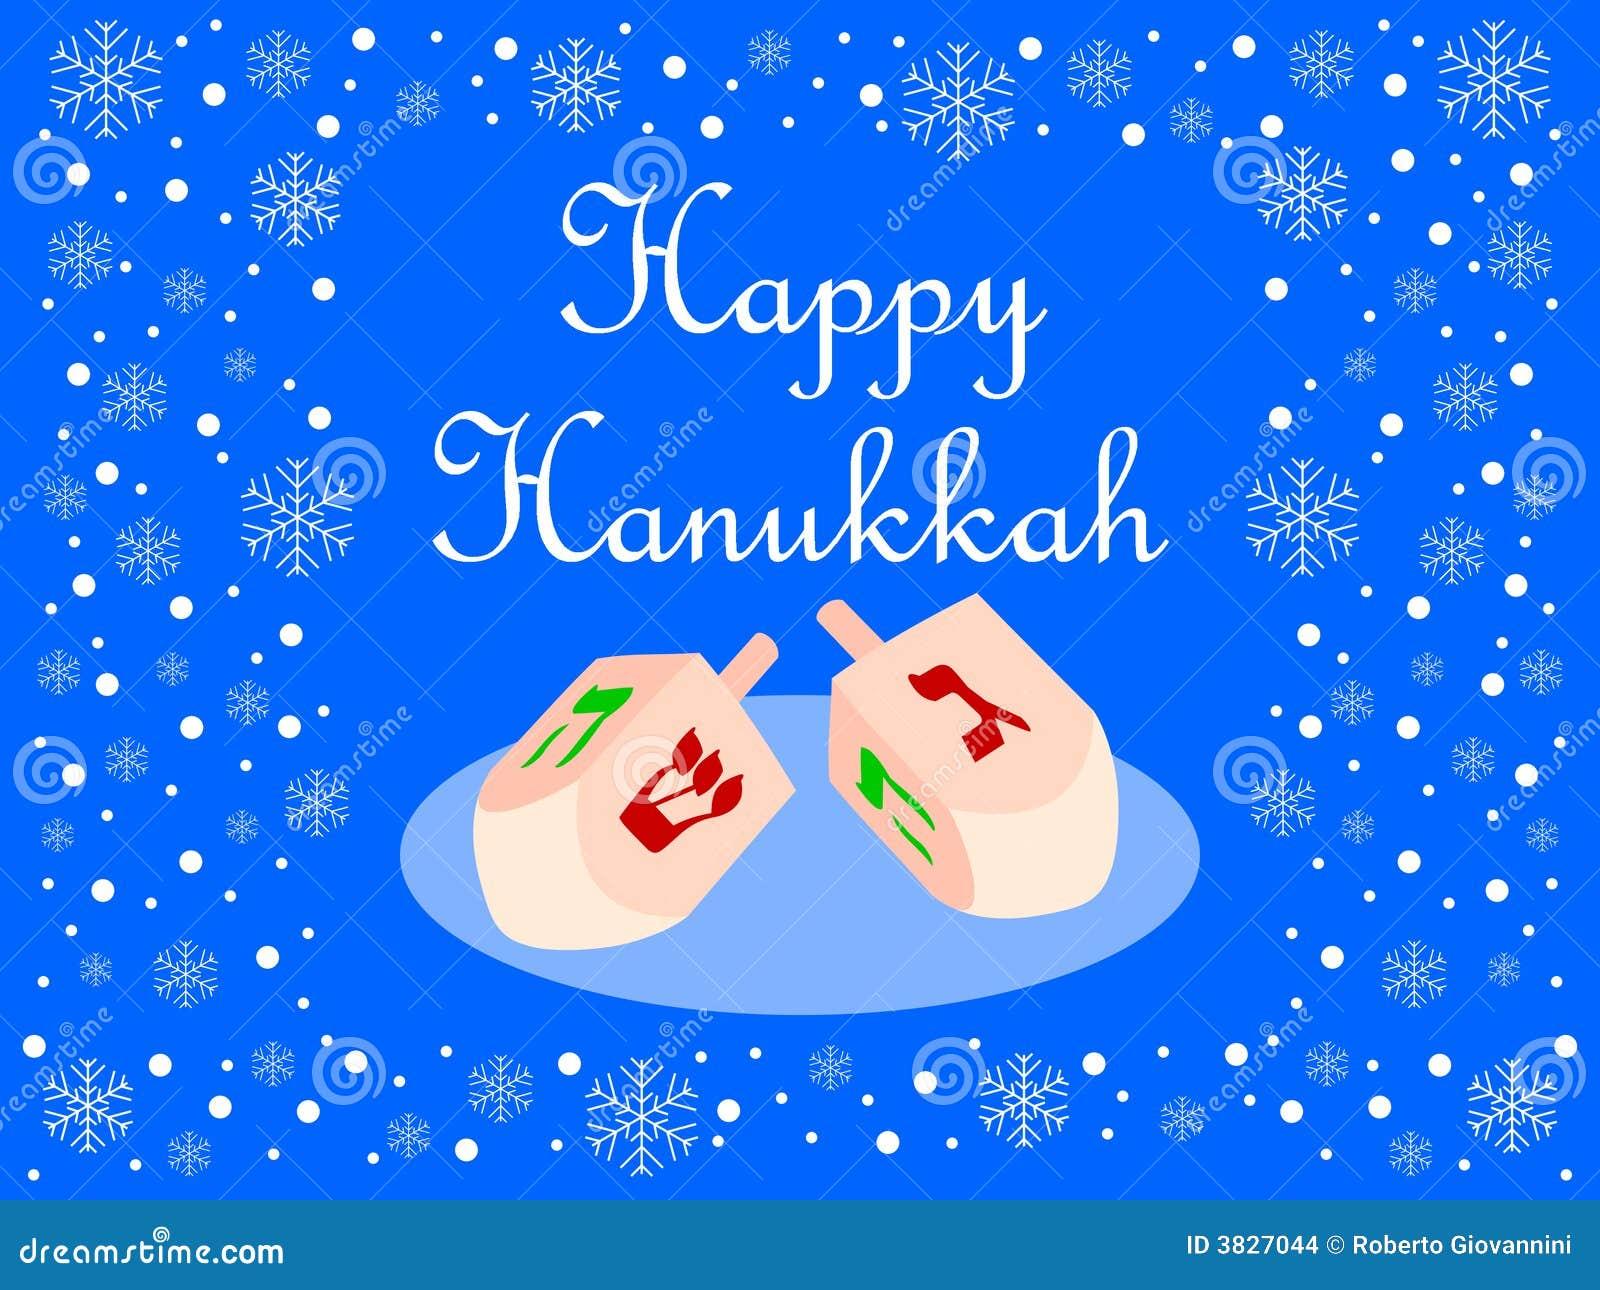 Blue Happy Hanukkah Card Stock Images Image 3827044